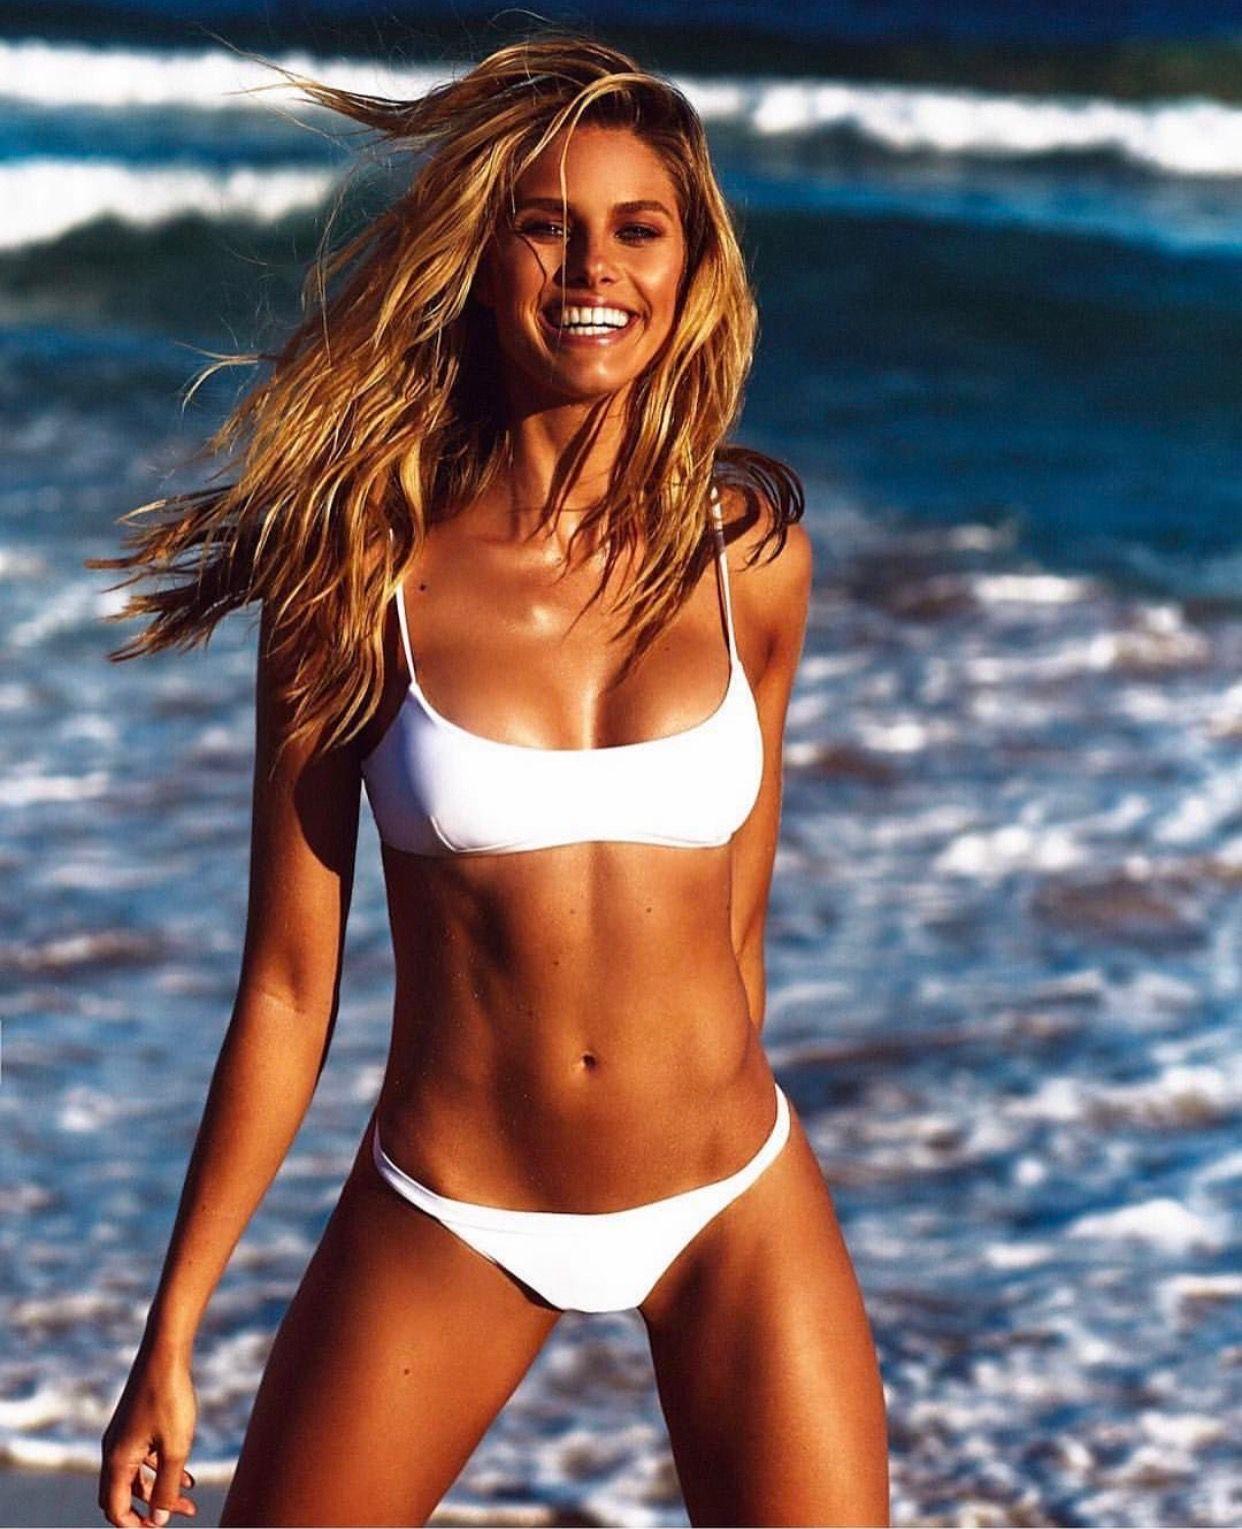 f5f784799f Natalie Roser Push Up Swimsuit, Swimsuit Tops, Halter Bikini, Bikini  Swimwear, Sexy